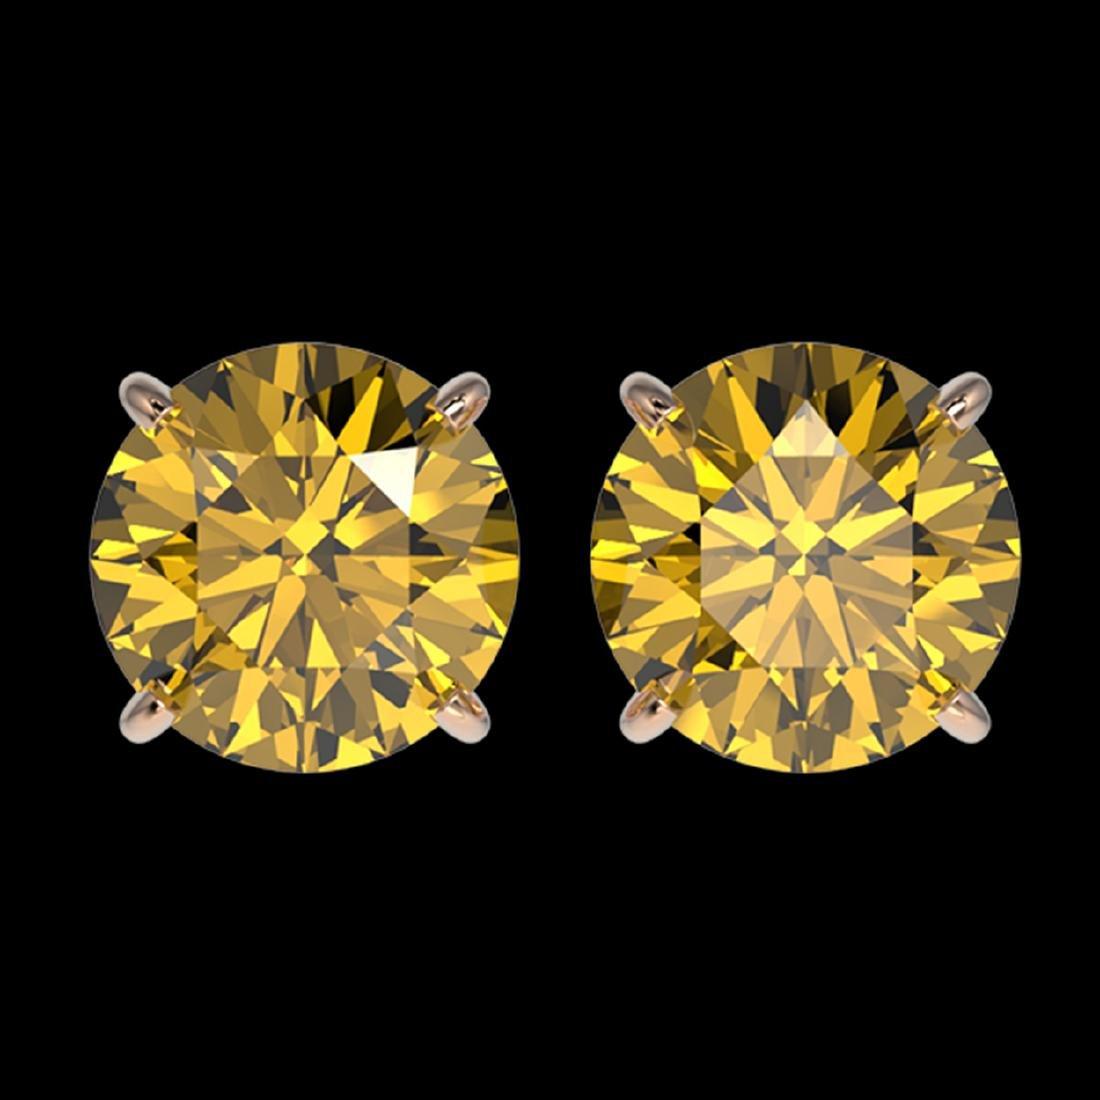 3 ctw Intense Yellow Diamond Stud Earrings 10K Rose